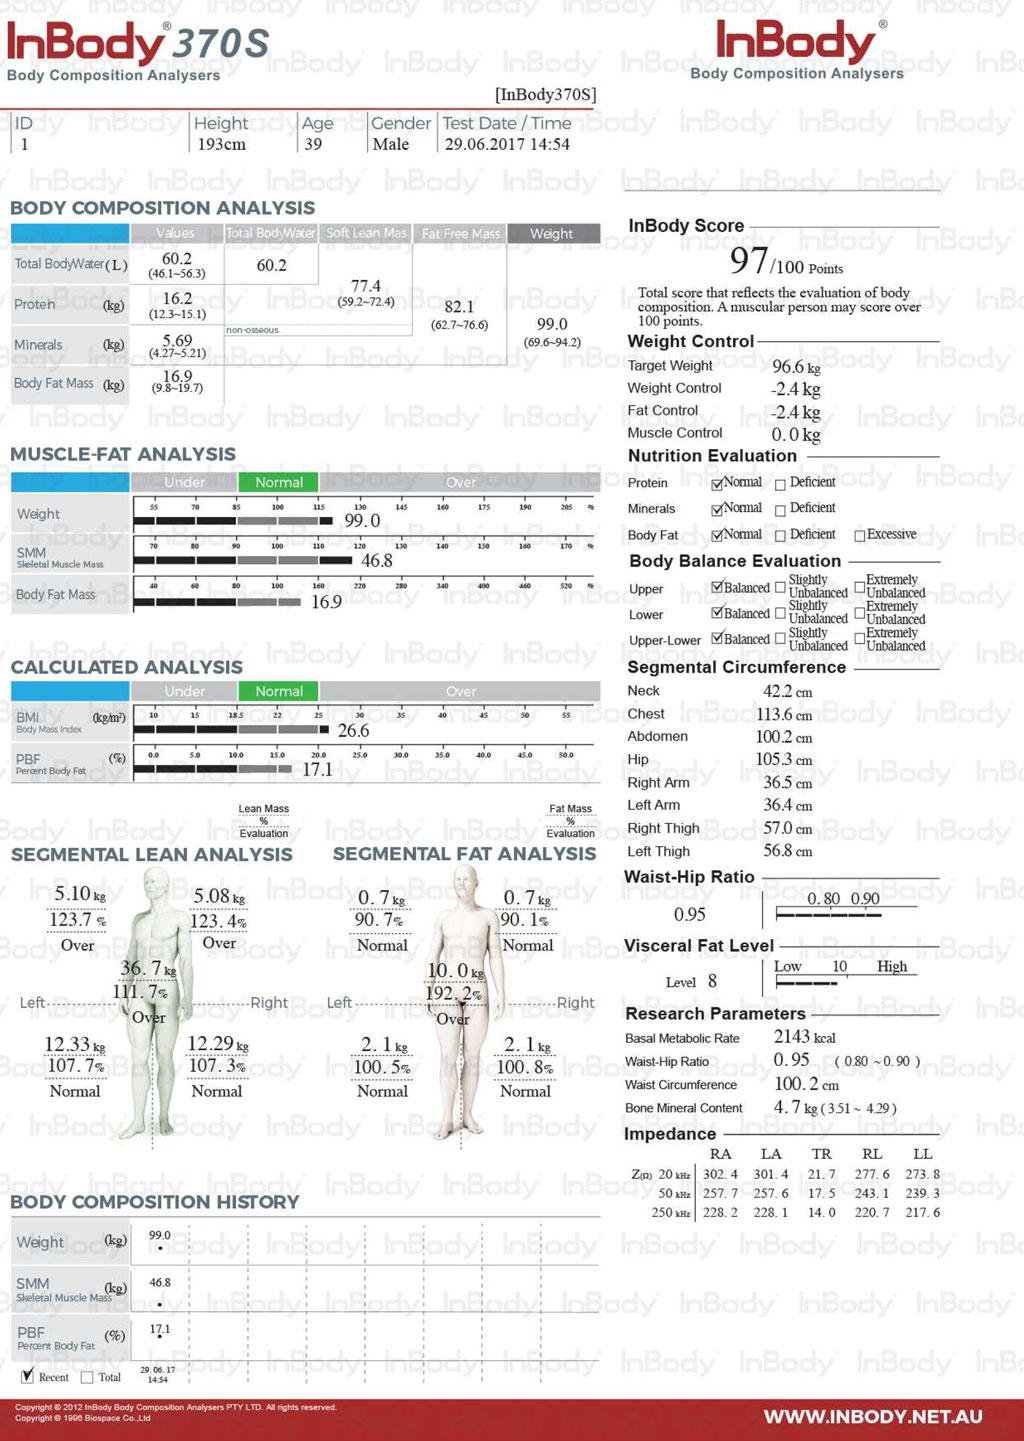 InBody 370s Sample Results